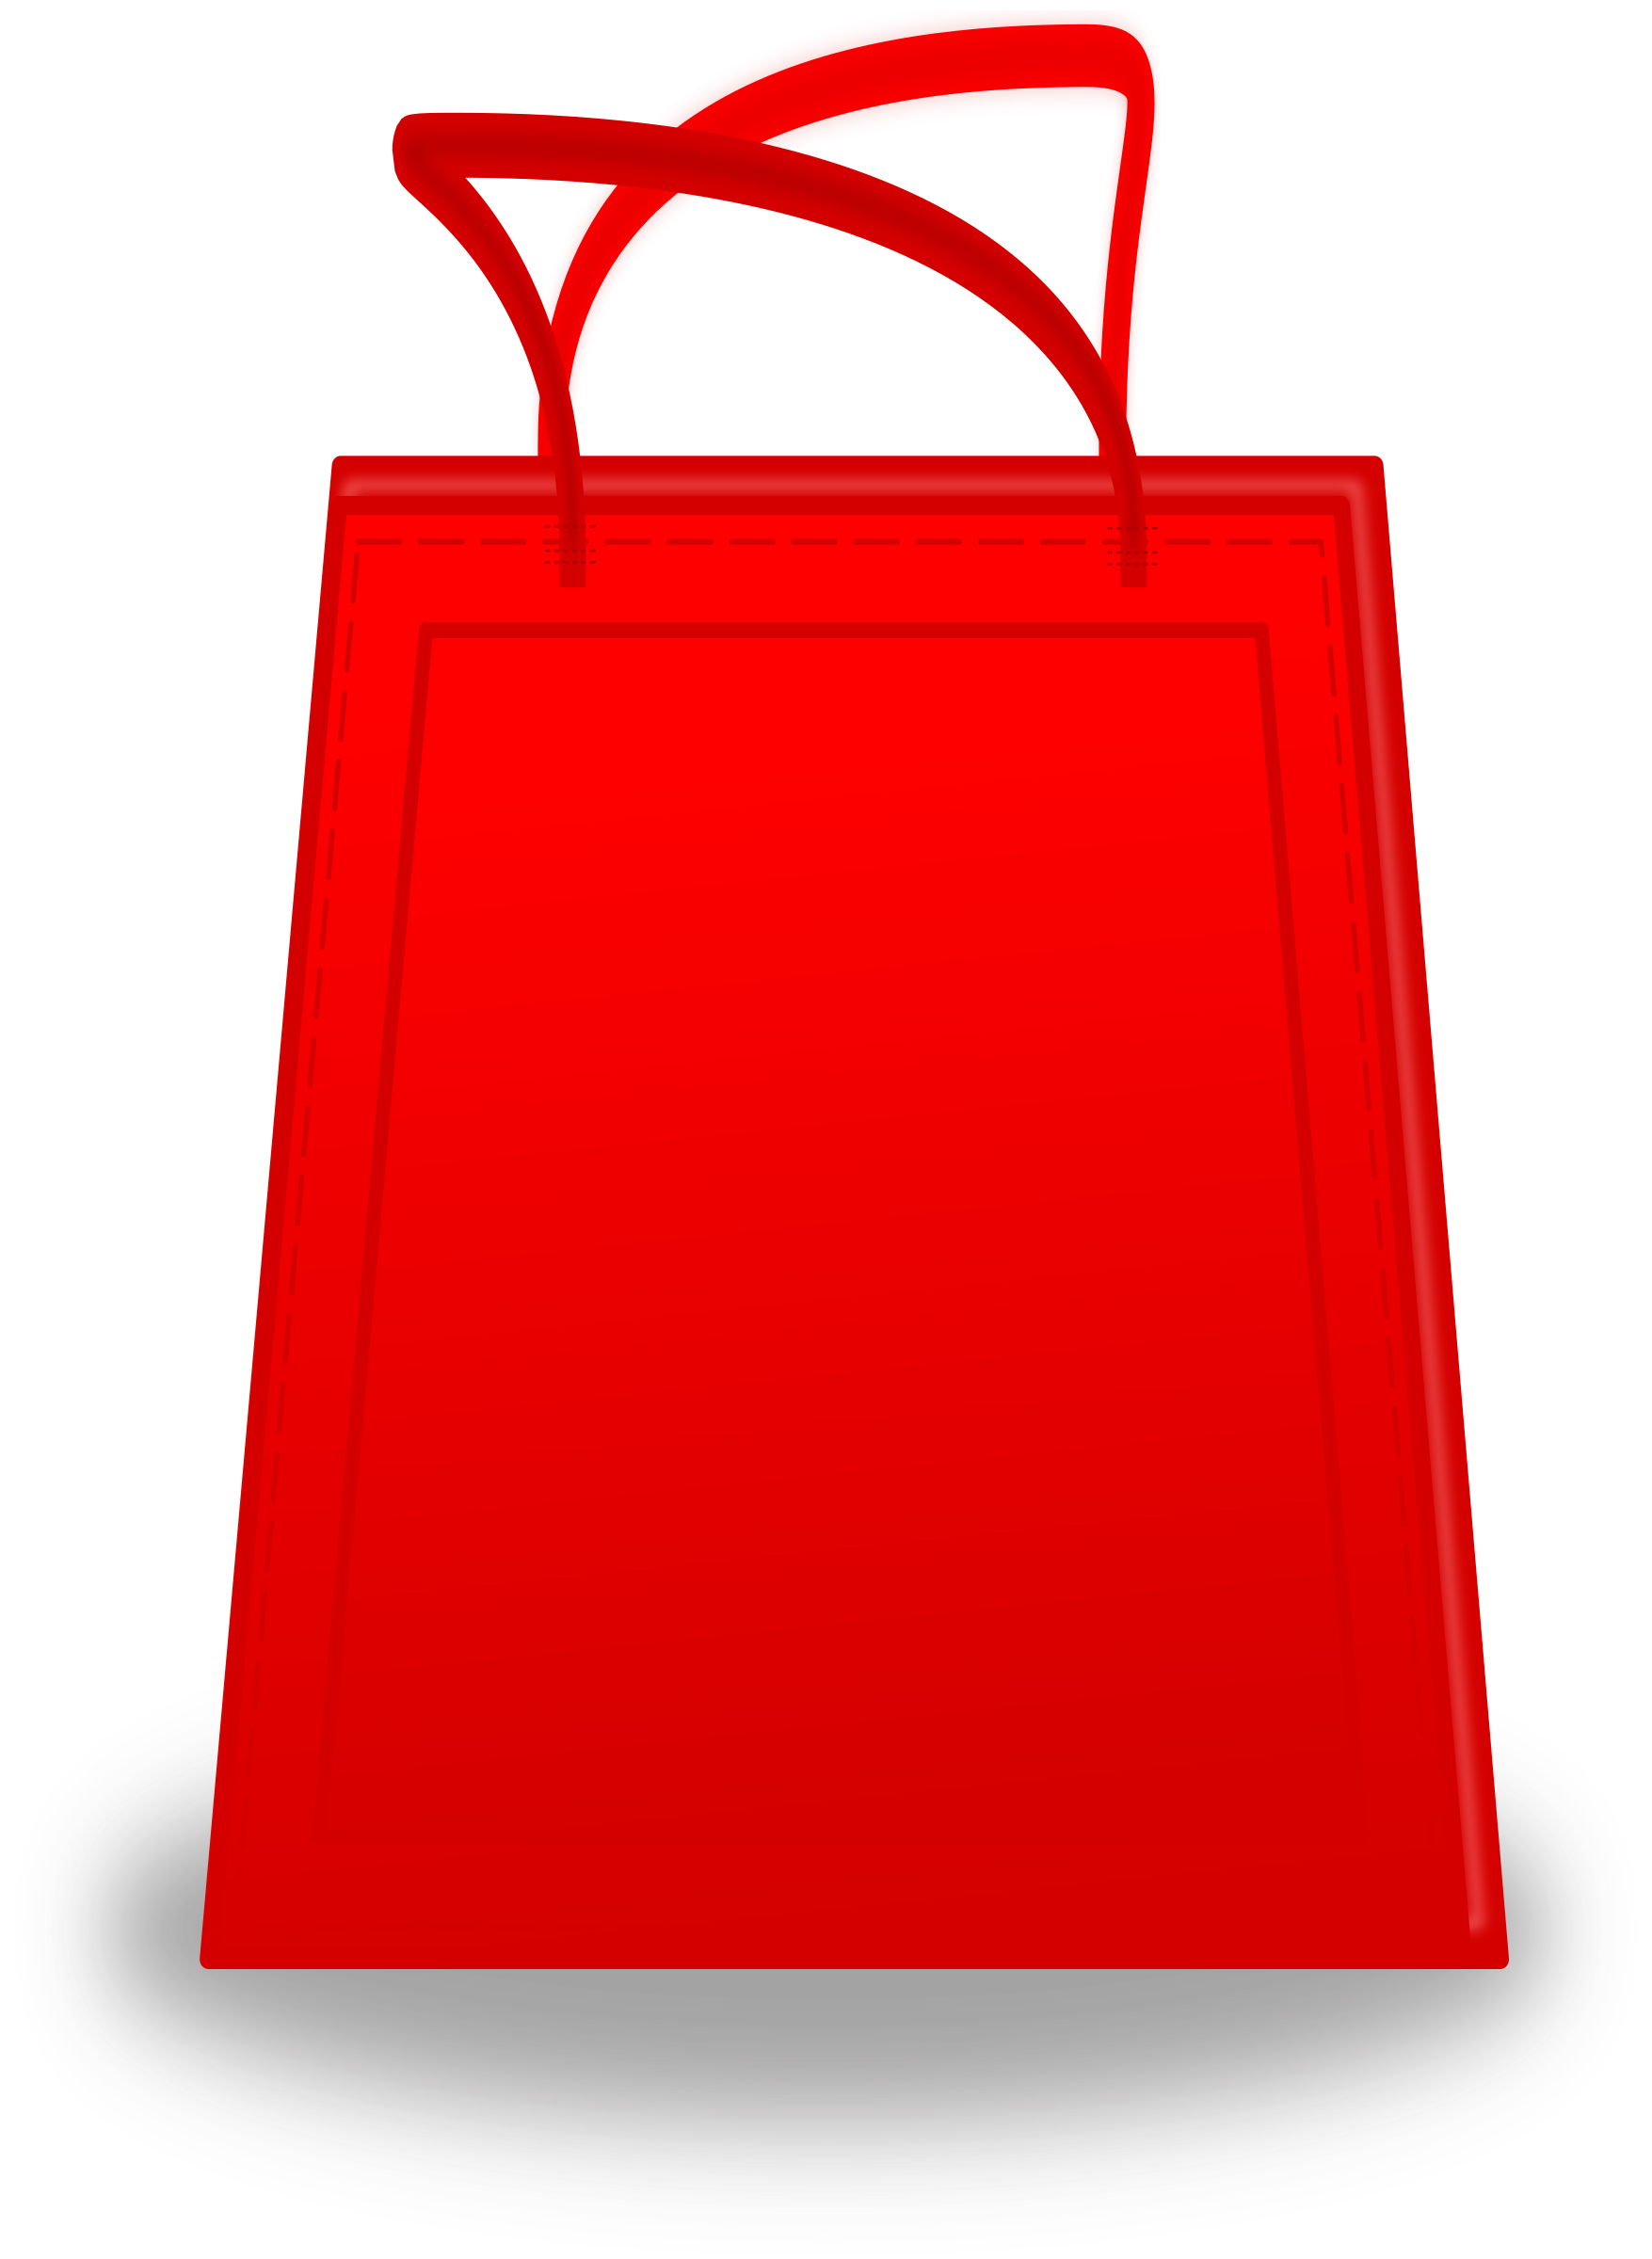 Bag clipart rectangle Bag Bag Shopping Clipart Shopping